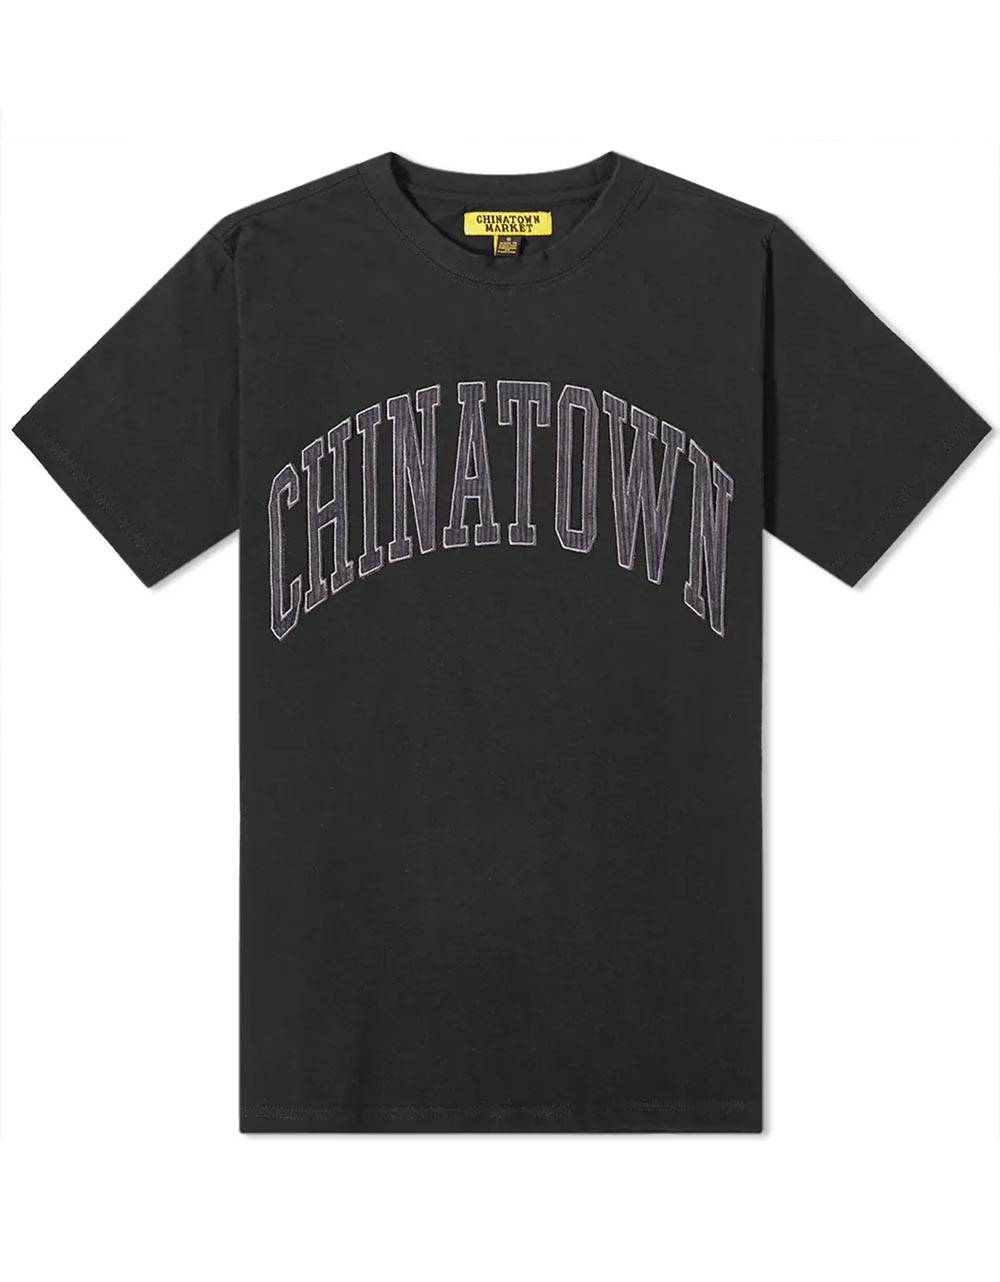 ChinaTown Market Corduroy tee - black Chinatown Market T-shirt 75,00€